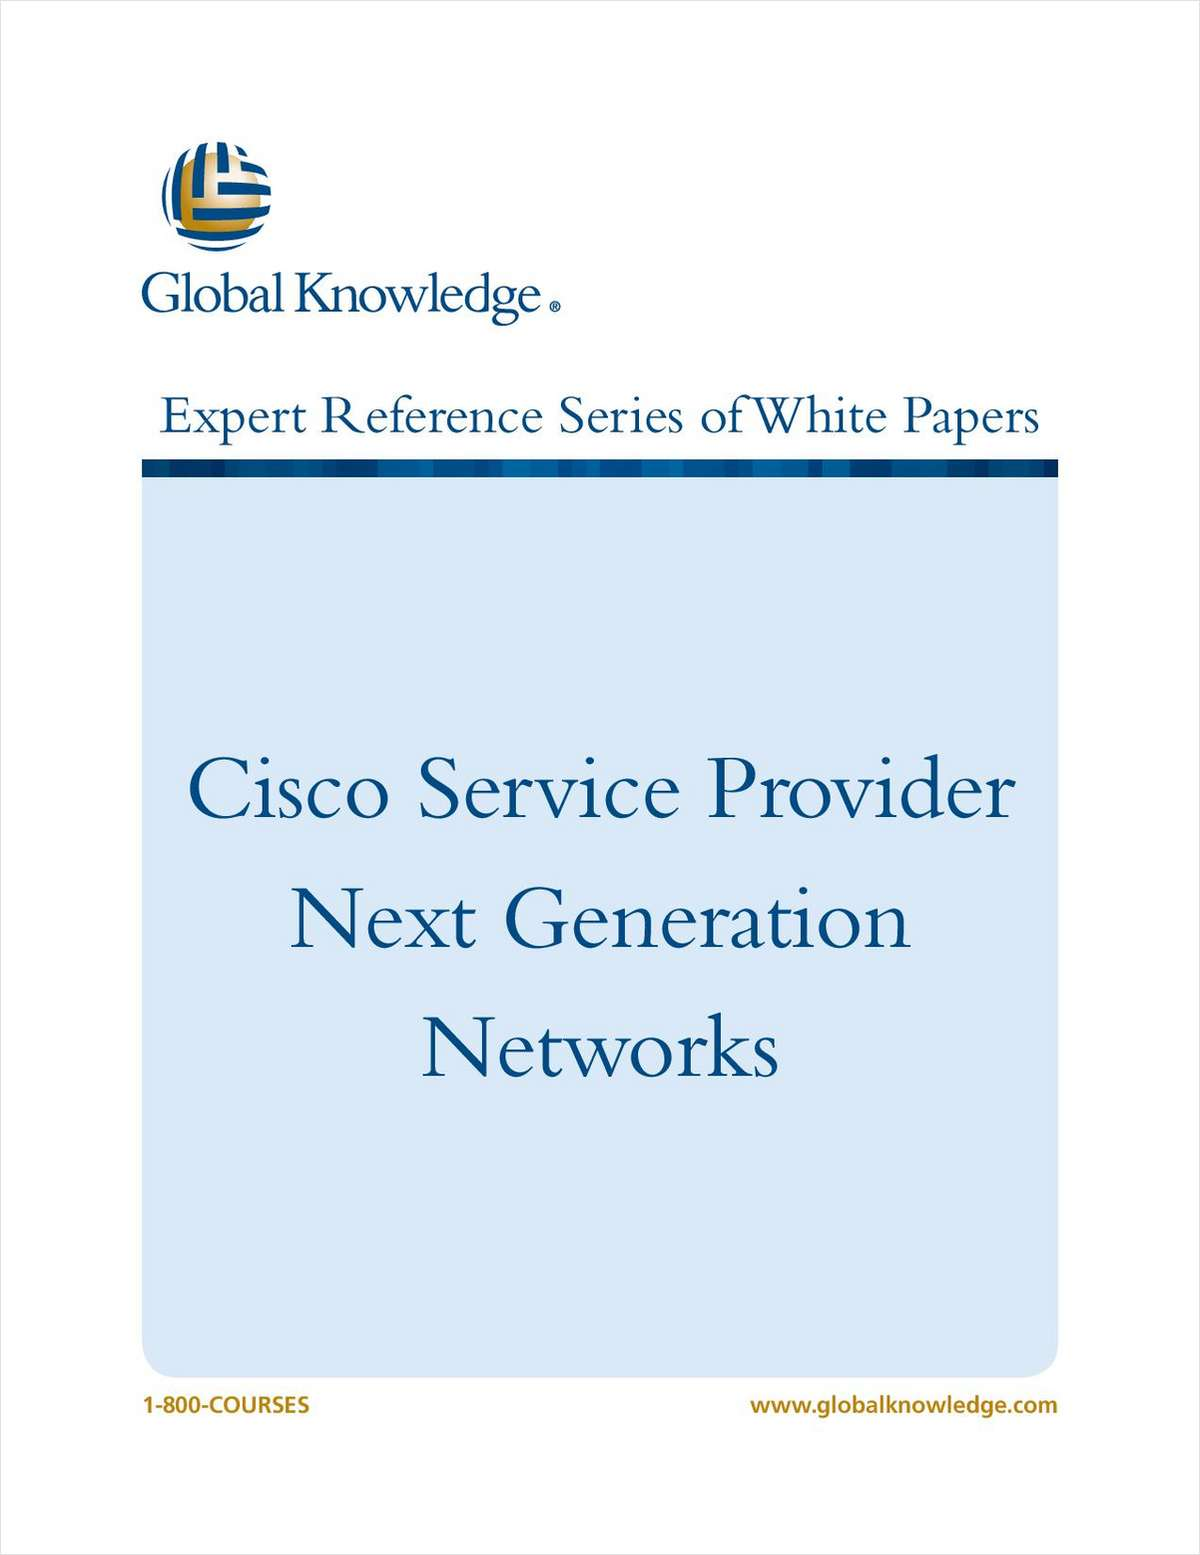 Cisco Service Provider Next Generation Networks